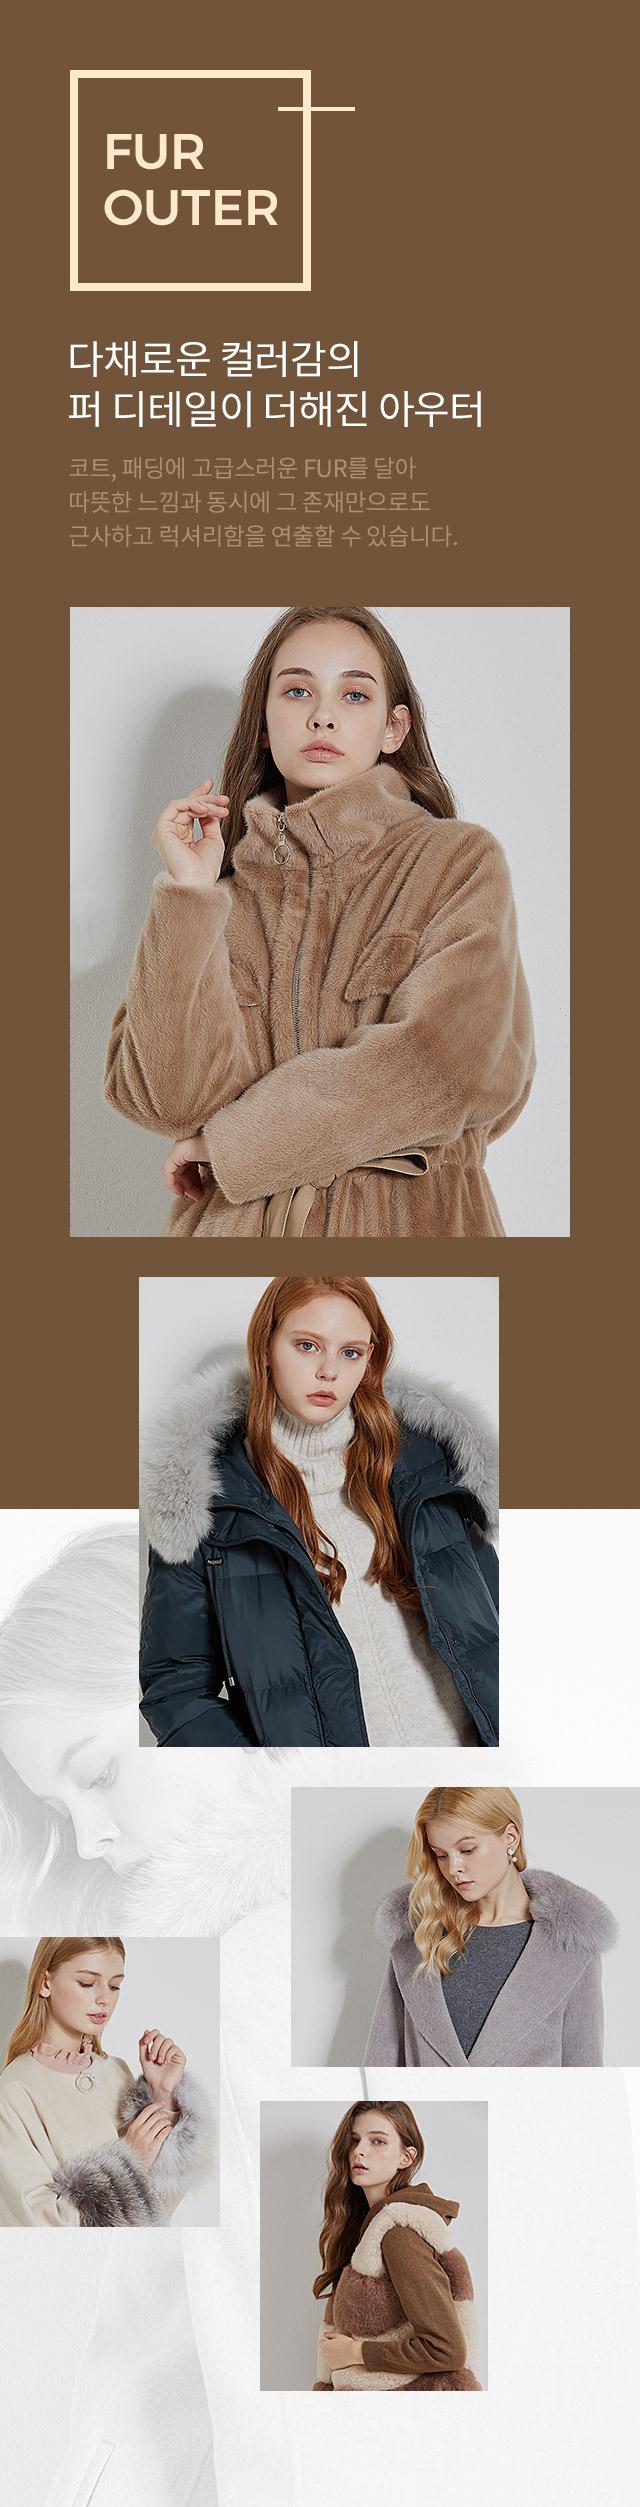 fur,outer,fur outer, 다채로운 컬러감의 퍼 디테일이 더해진 아우터, 코트,패딩에 고급스러운,fur를달아 따뜻한 느낌과 동시에 그 존재만으로도 근사하고, 럭셔리함을 연출 할 수있다.